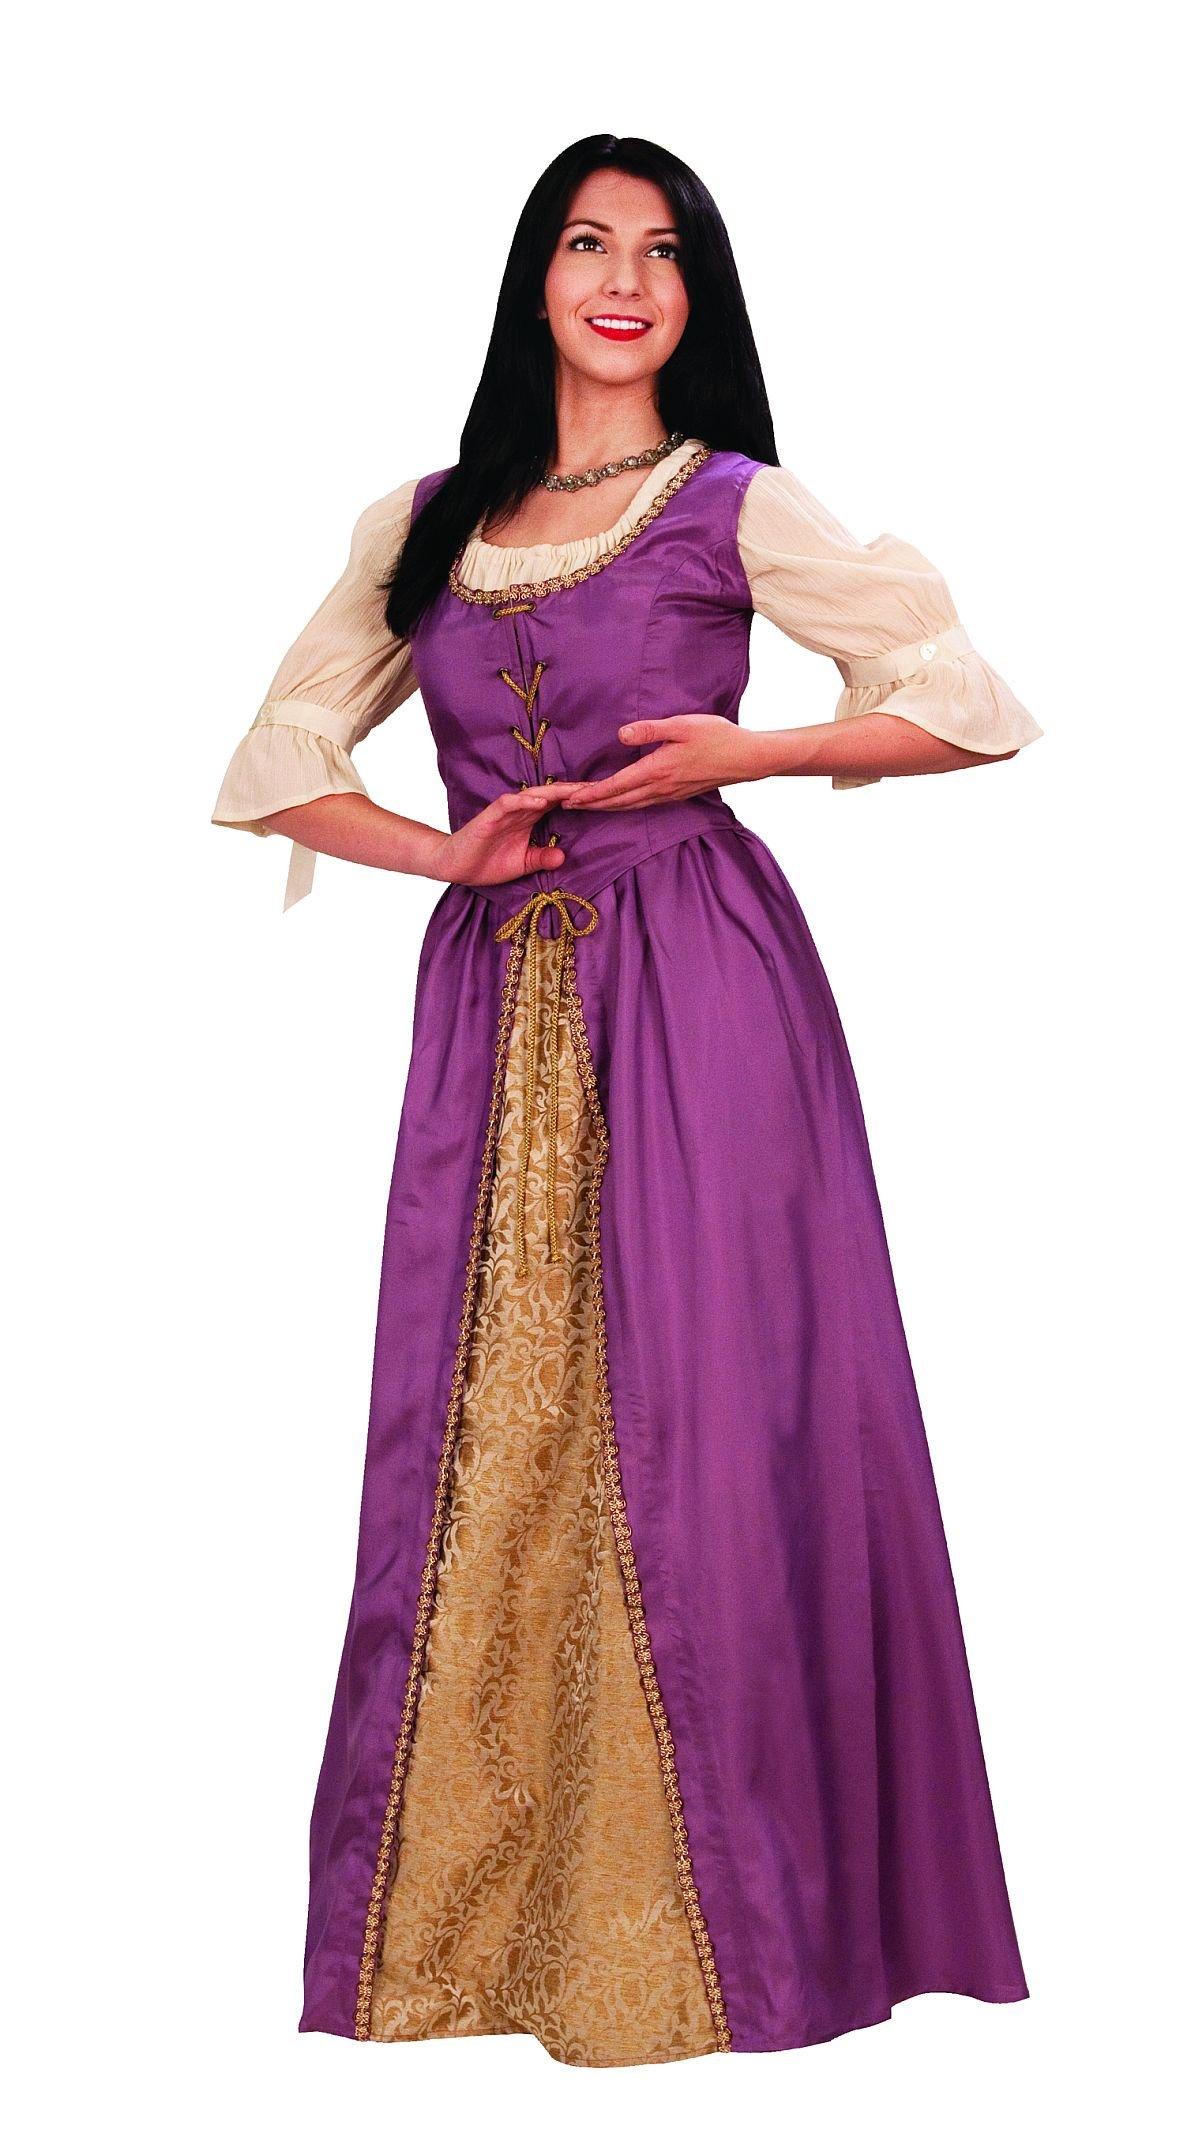 Museum Replicas Avington Gown Medieval Overdress Ladies Ren Faire Costume (Small, Lavender)